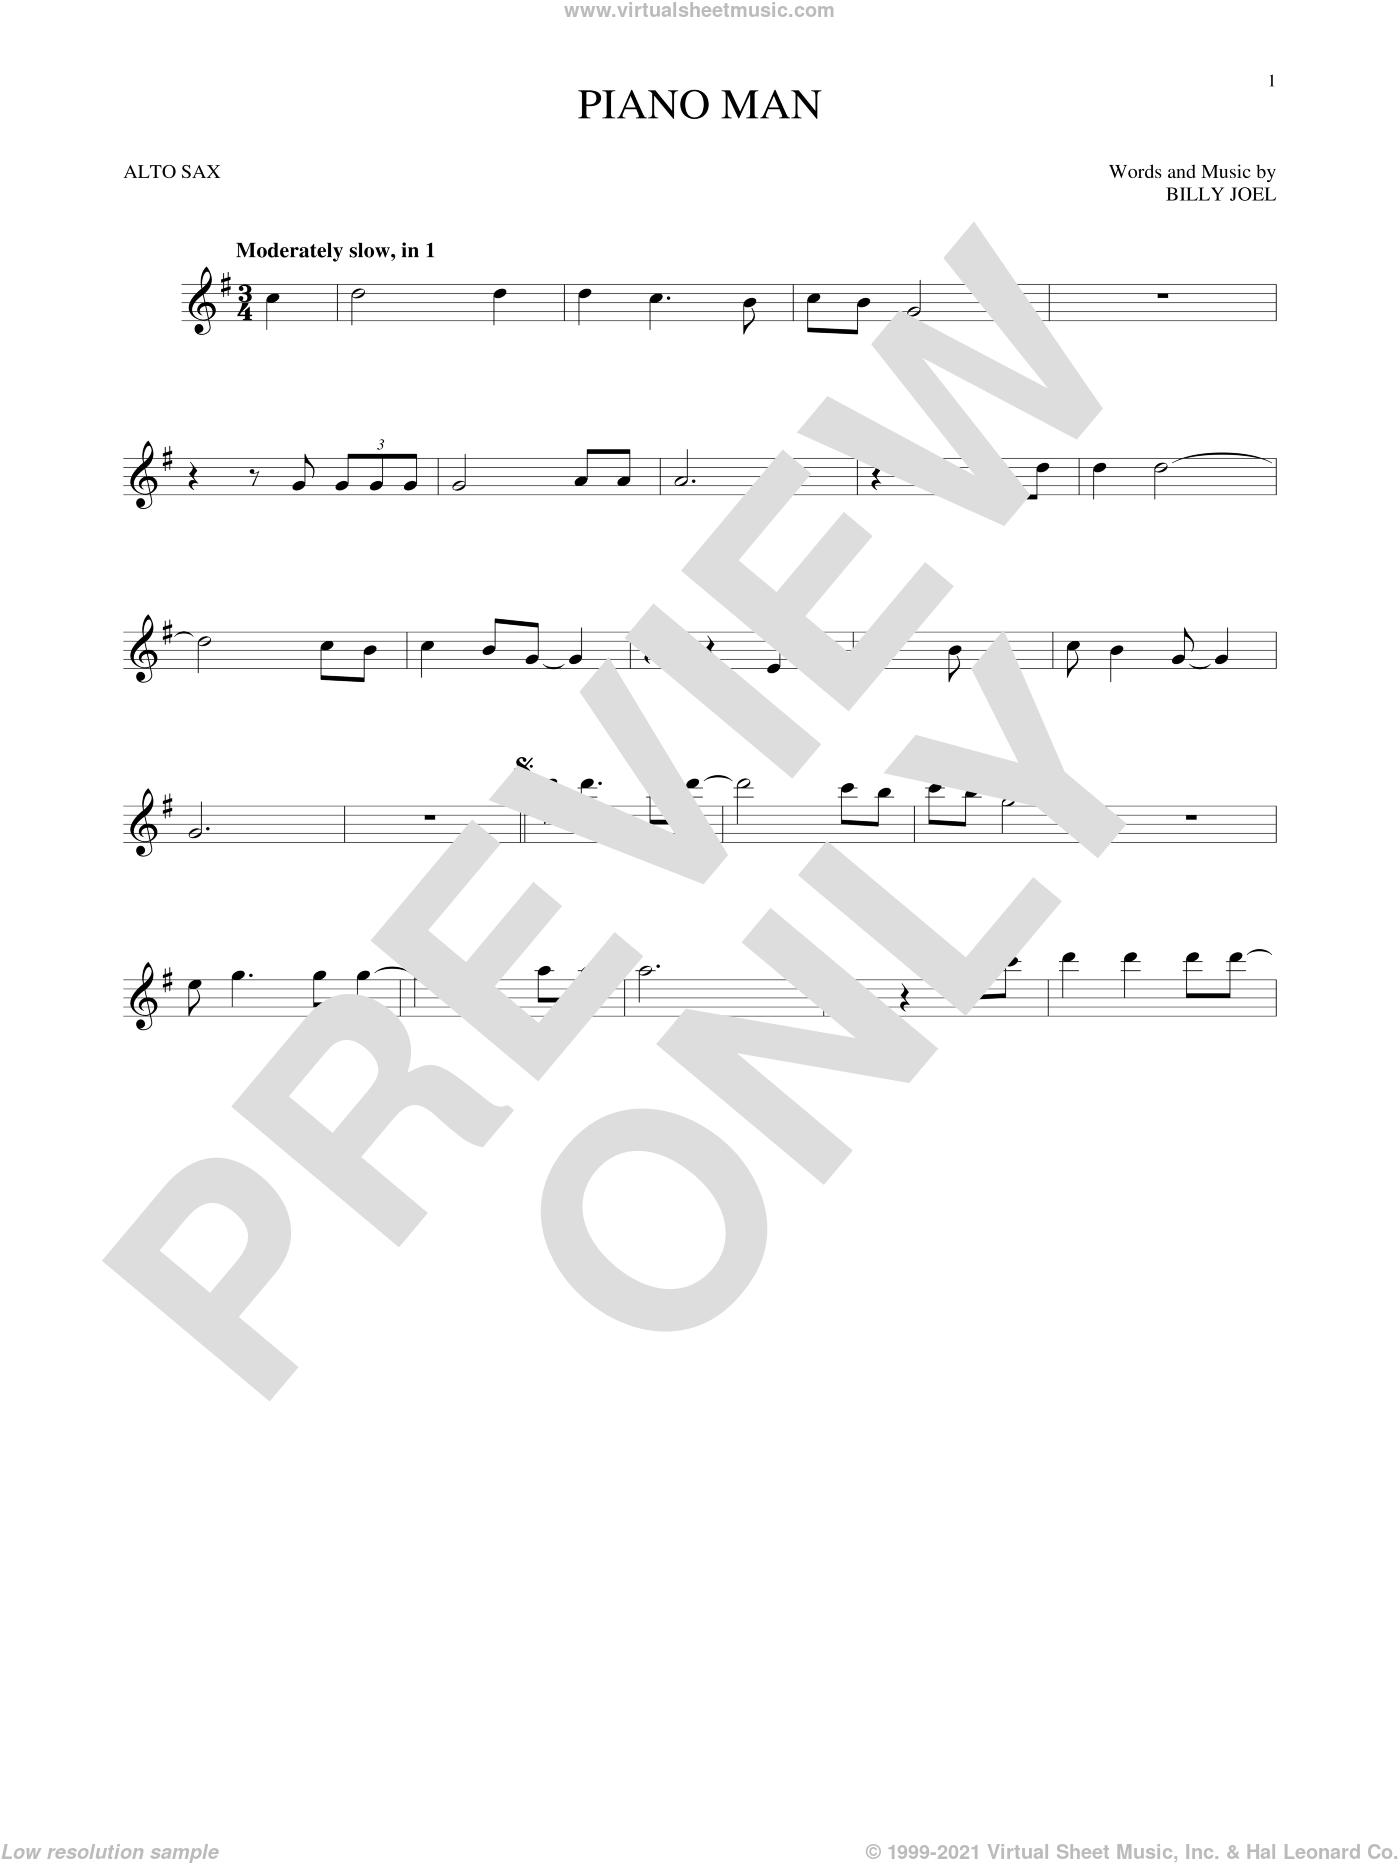 Piano Man sheet music for alto saxophone solo by Billy Joel, intermediate skill level